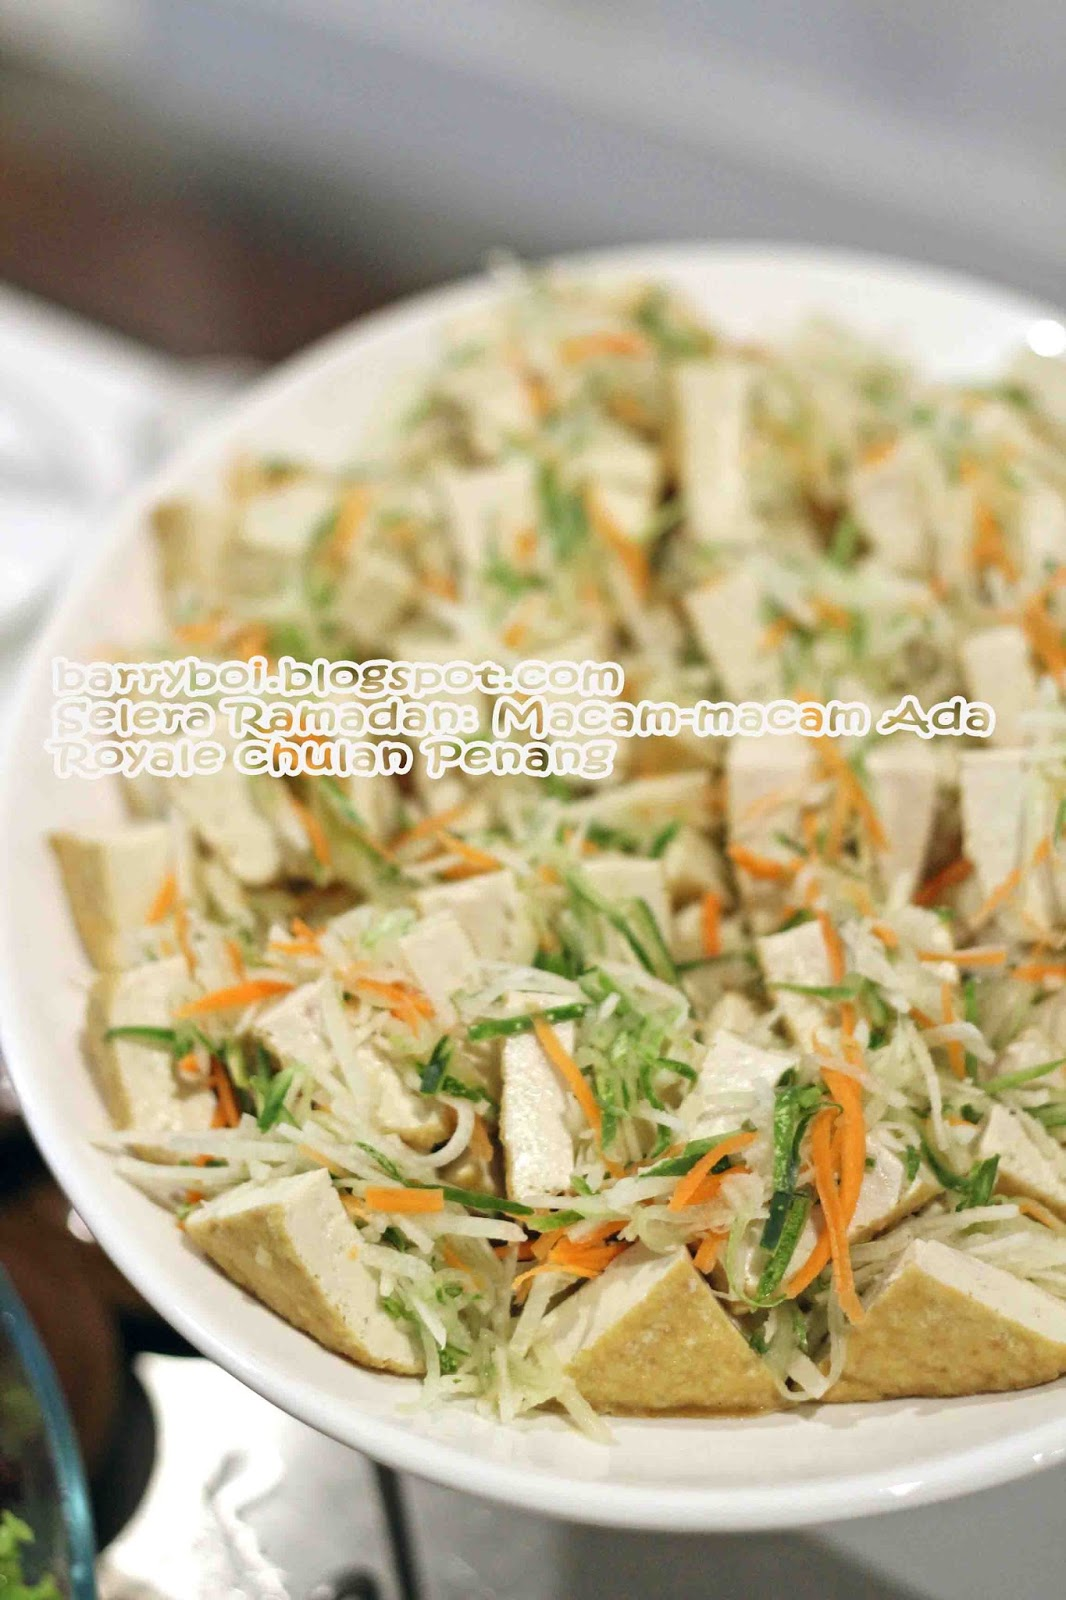 Jenis Jenis Appetizer : jenis, appetizer, Selera, Ramadan:, Macam-macam, Royale, Chulan, Penang